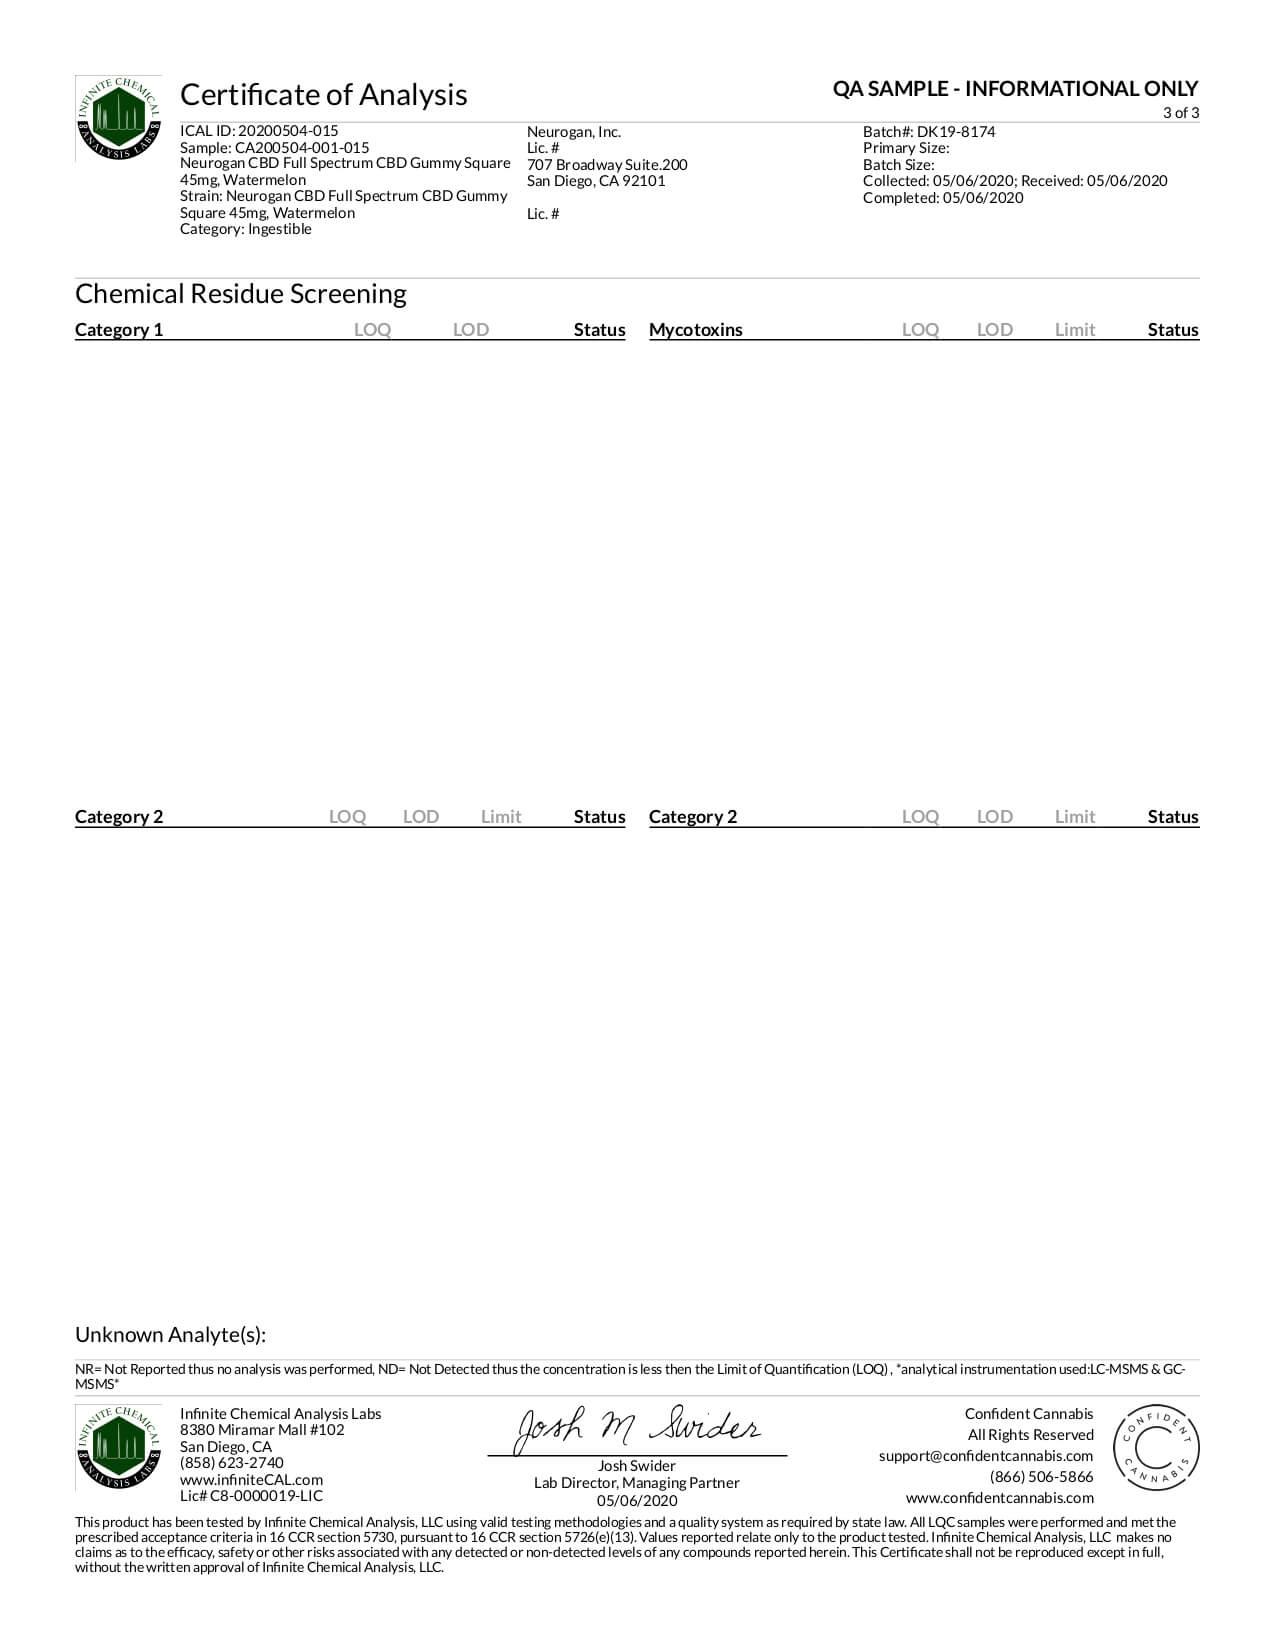 Neurogan, Inc. CBD Edible Full Spectrum Gummy Squares Fresh Watermleon Lab Report